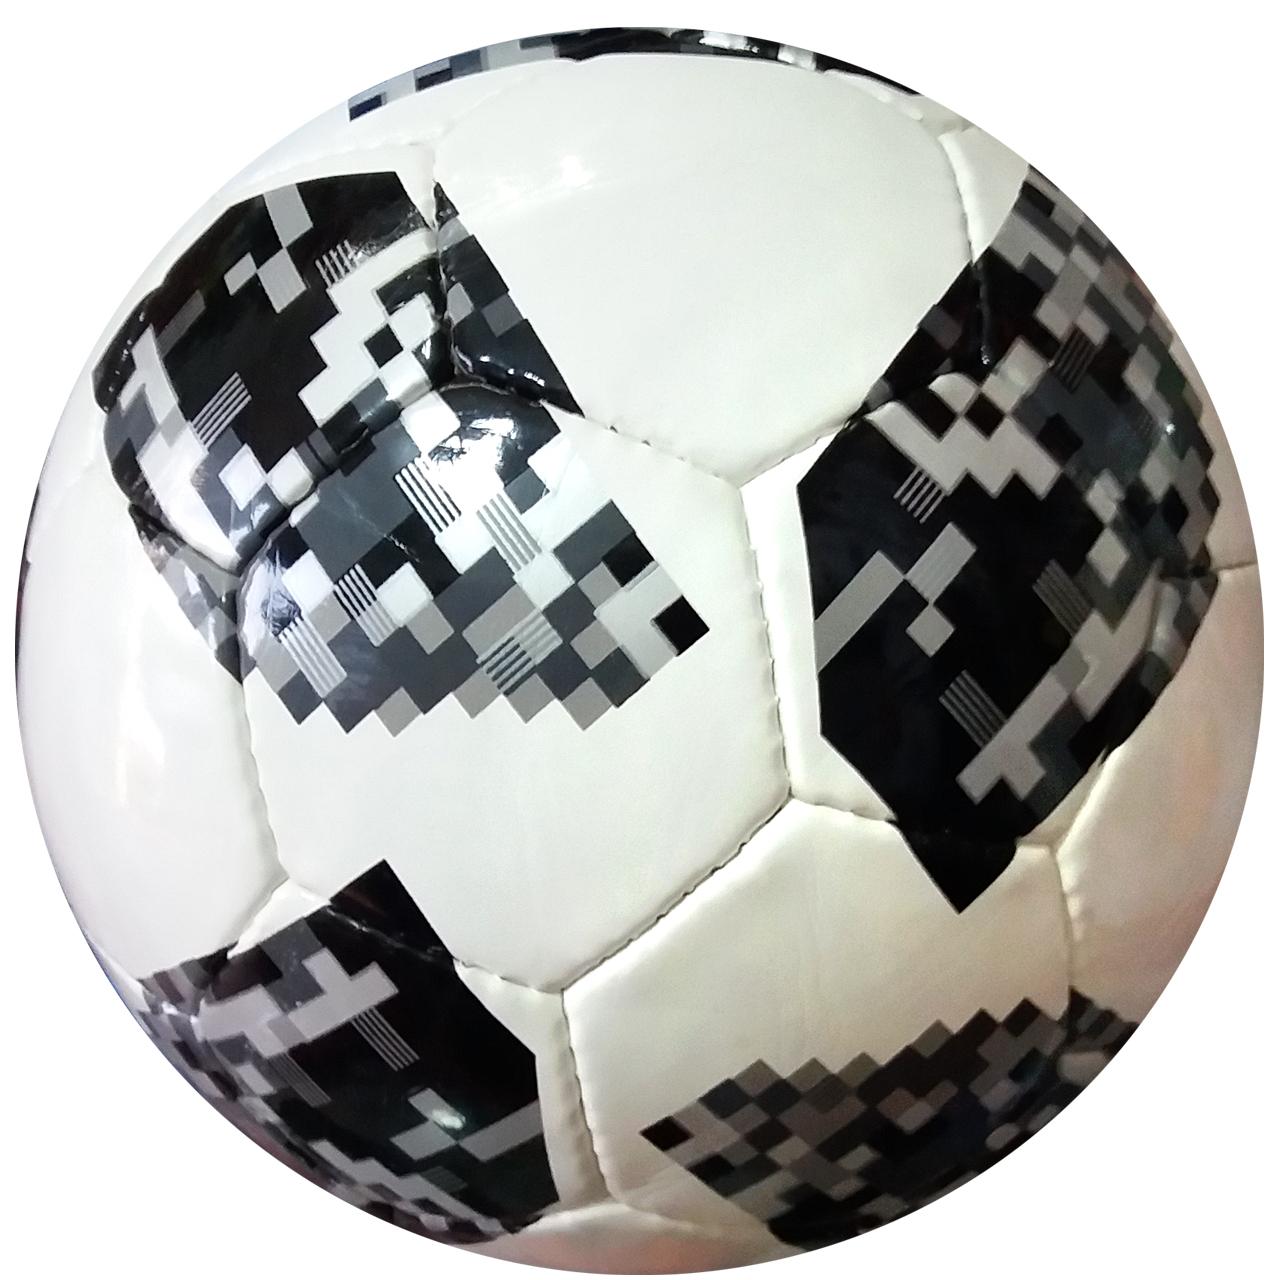 توپ فوتبال جام جهانی 2018 مدل اسپرت سایز 5